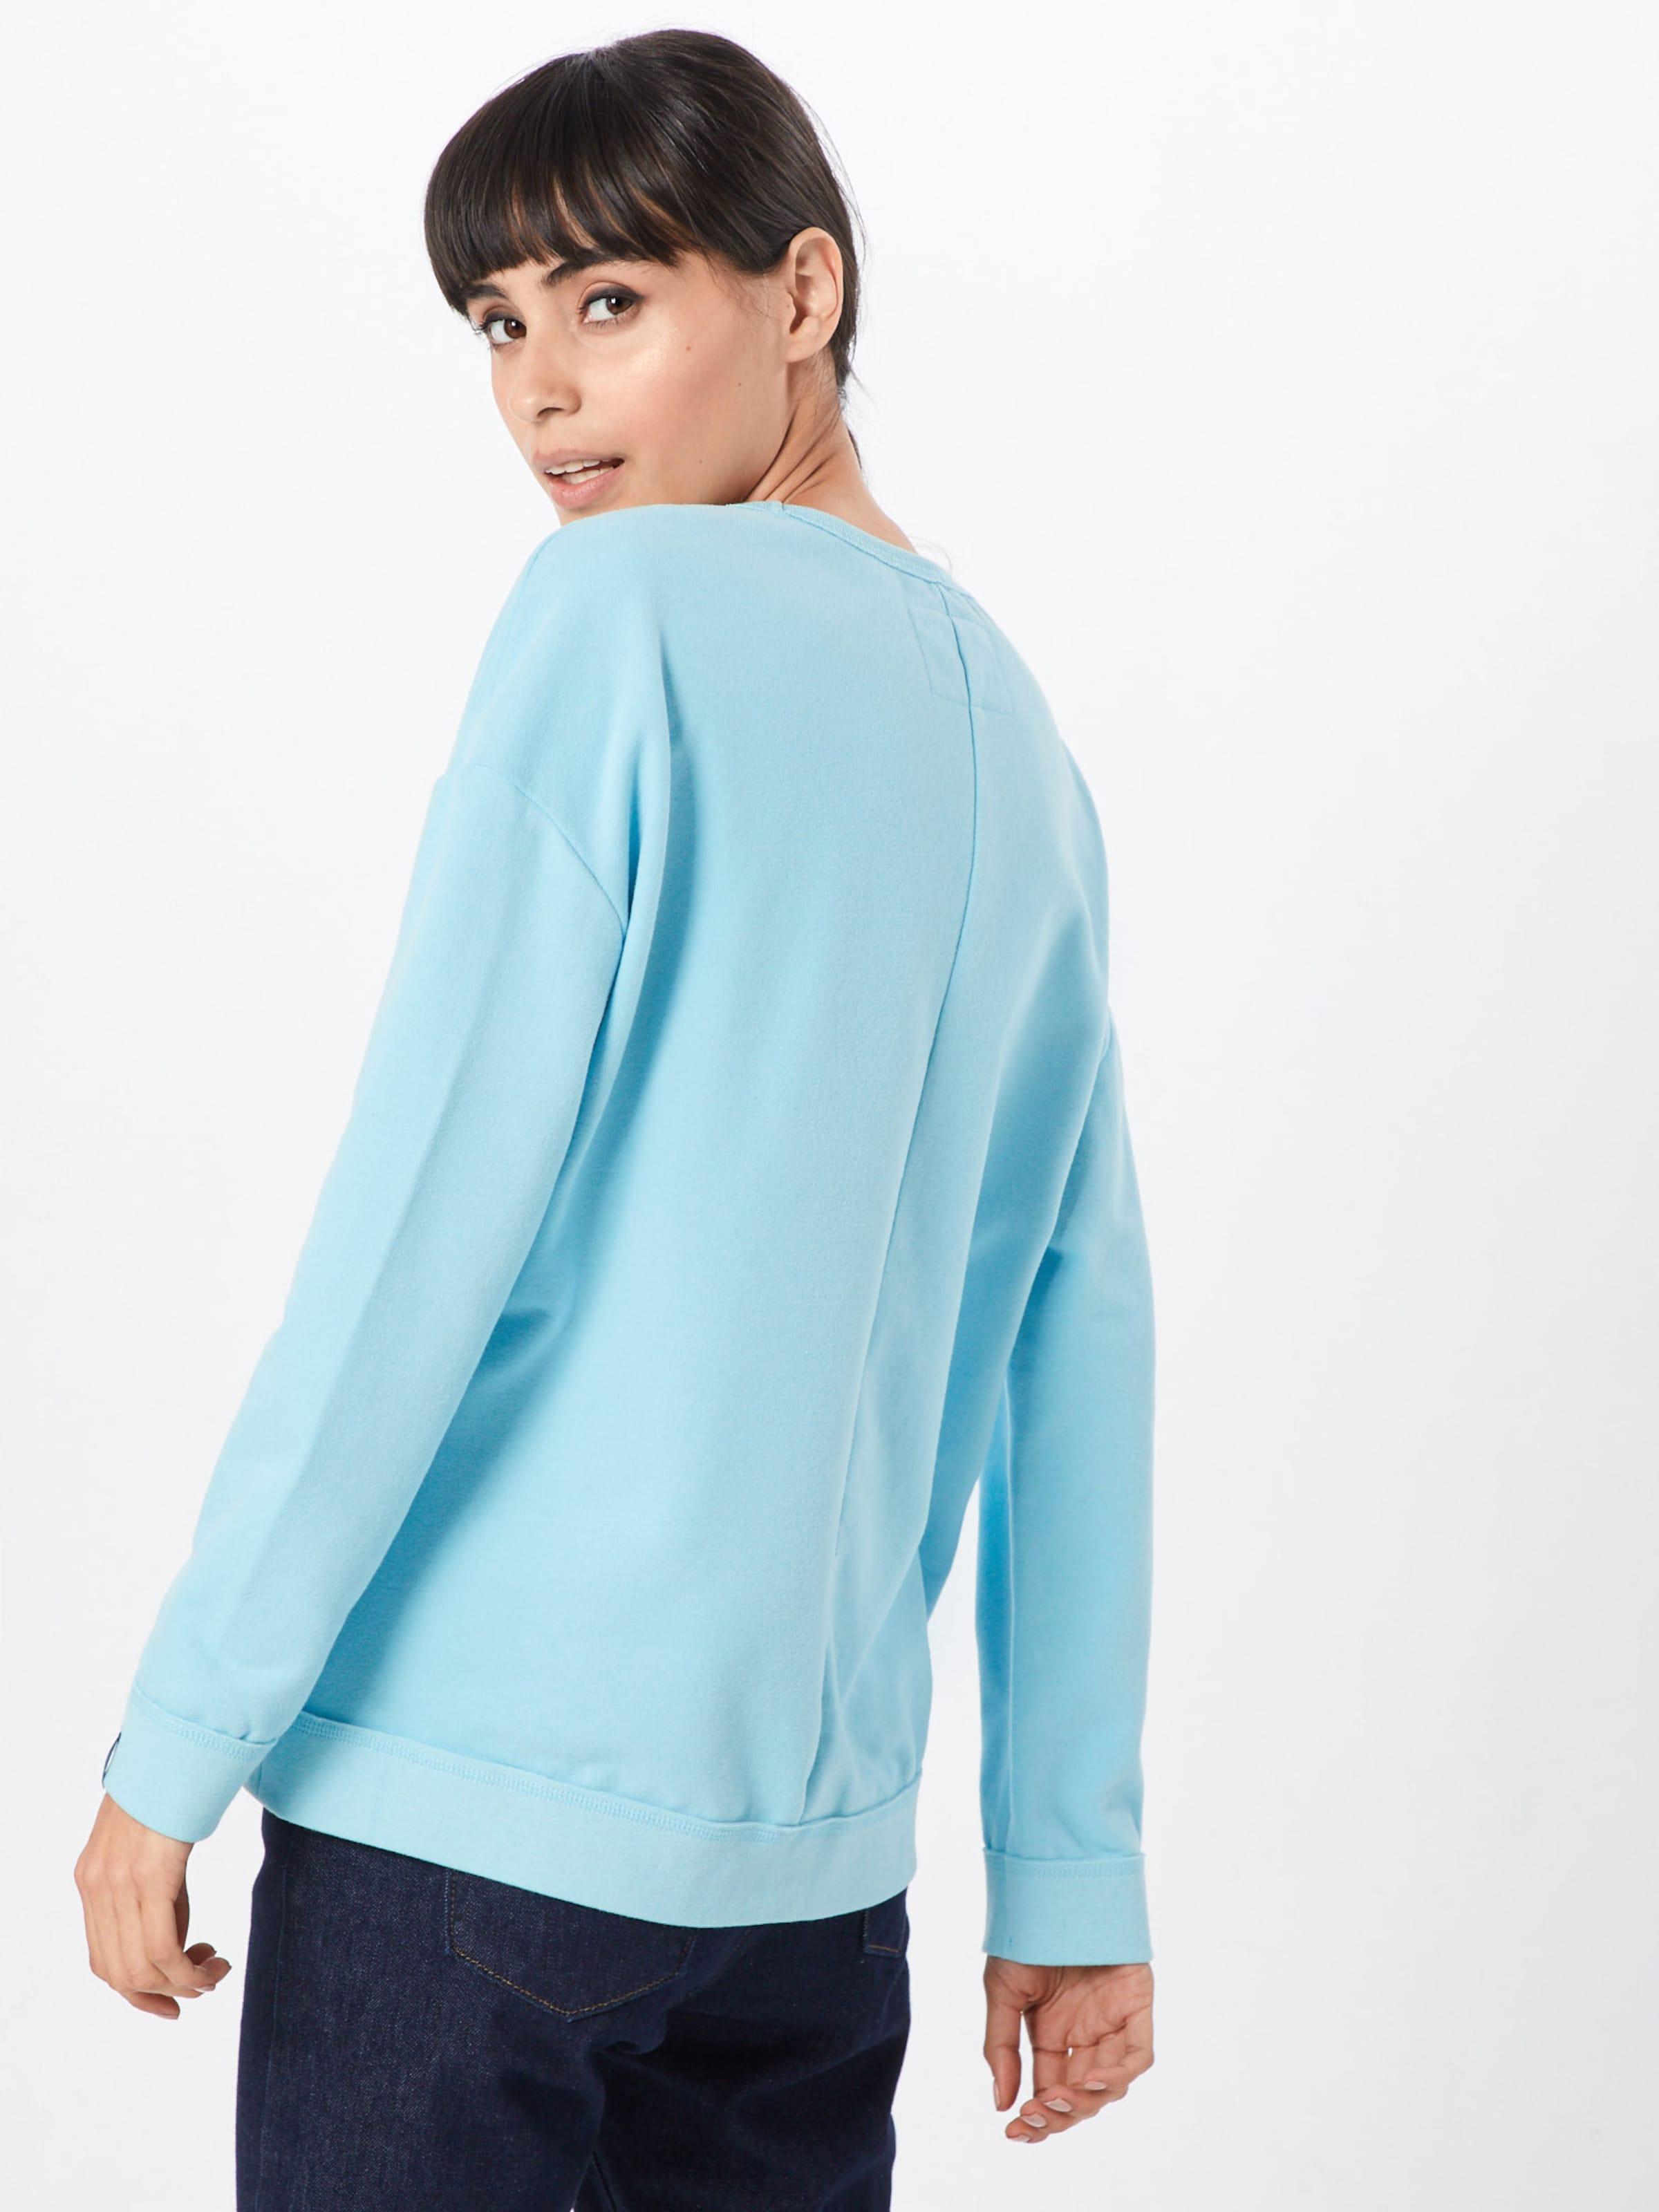 'stars' Religion In Blau Sweatshirt True OZiTkPXu